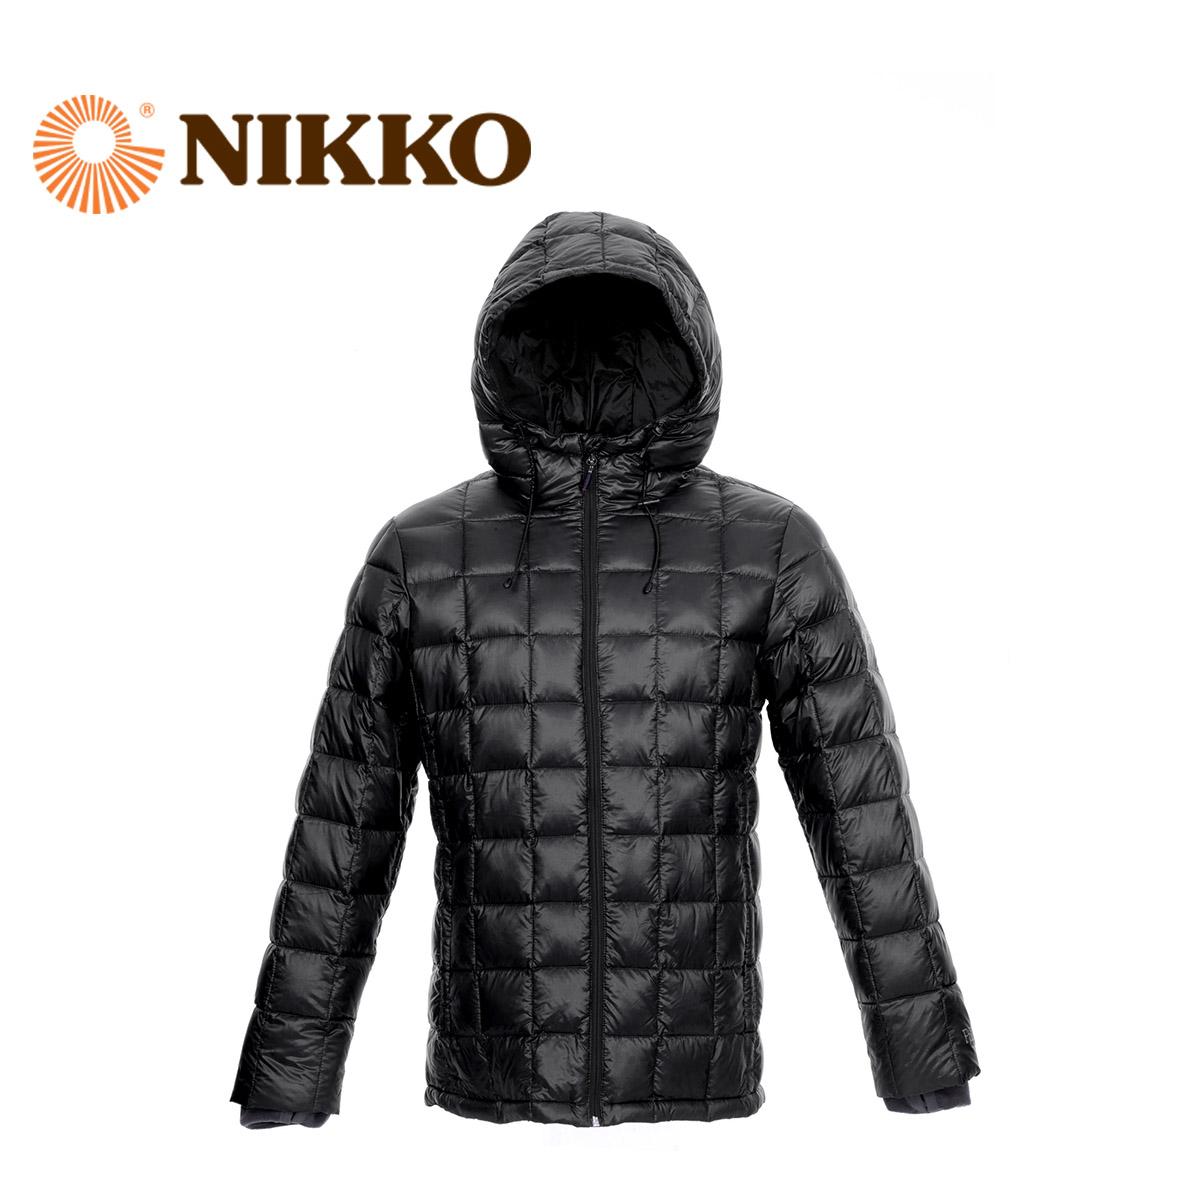 Nikko日高 白鵝絨戶外保暖外套輕便防風男女情侶羽絨服WEB3104006